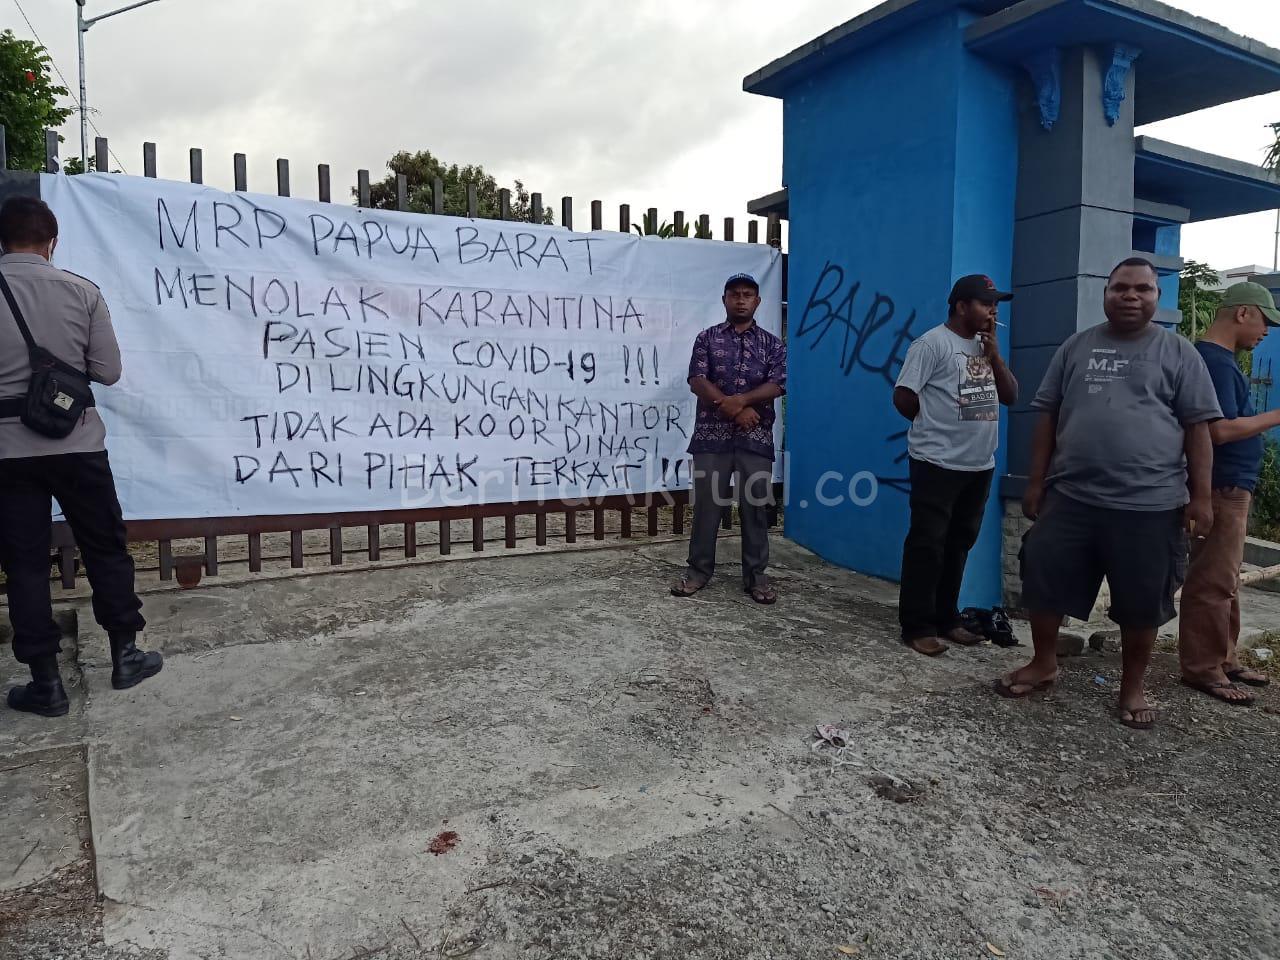 Hendak Diisolasi di Kantor Balai UMKM, Warga Manokwari Tolak 2 Pasien COVID-19 1 IMG 20200417 WA0029